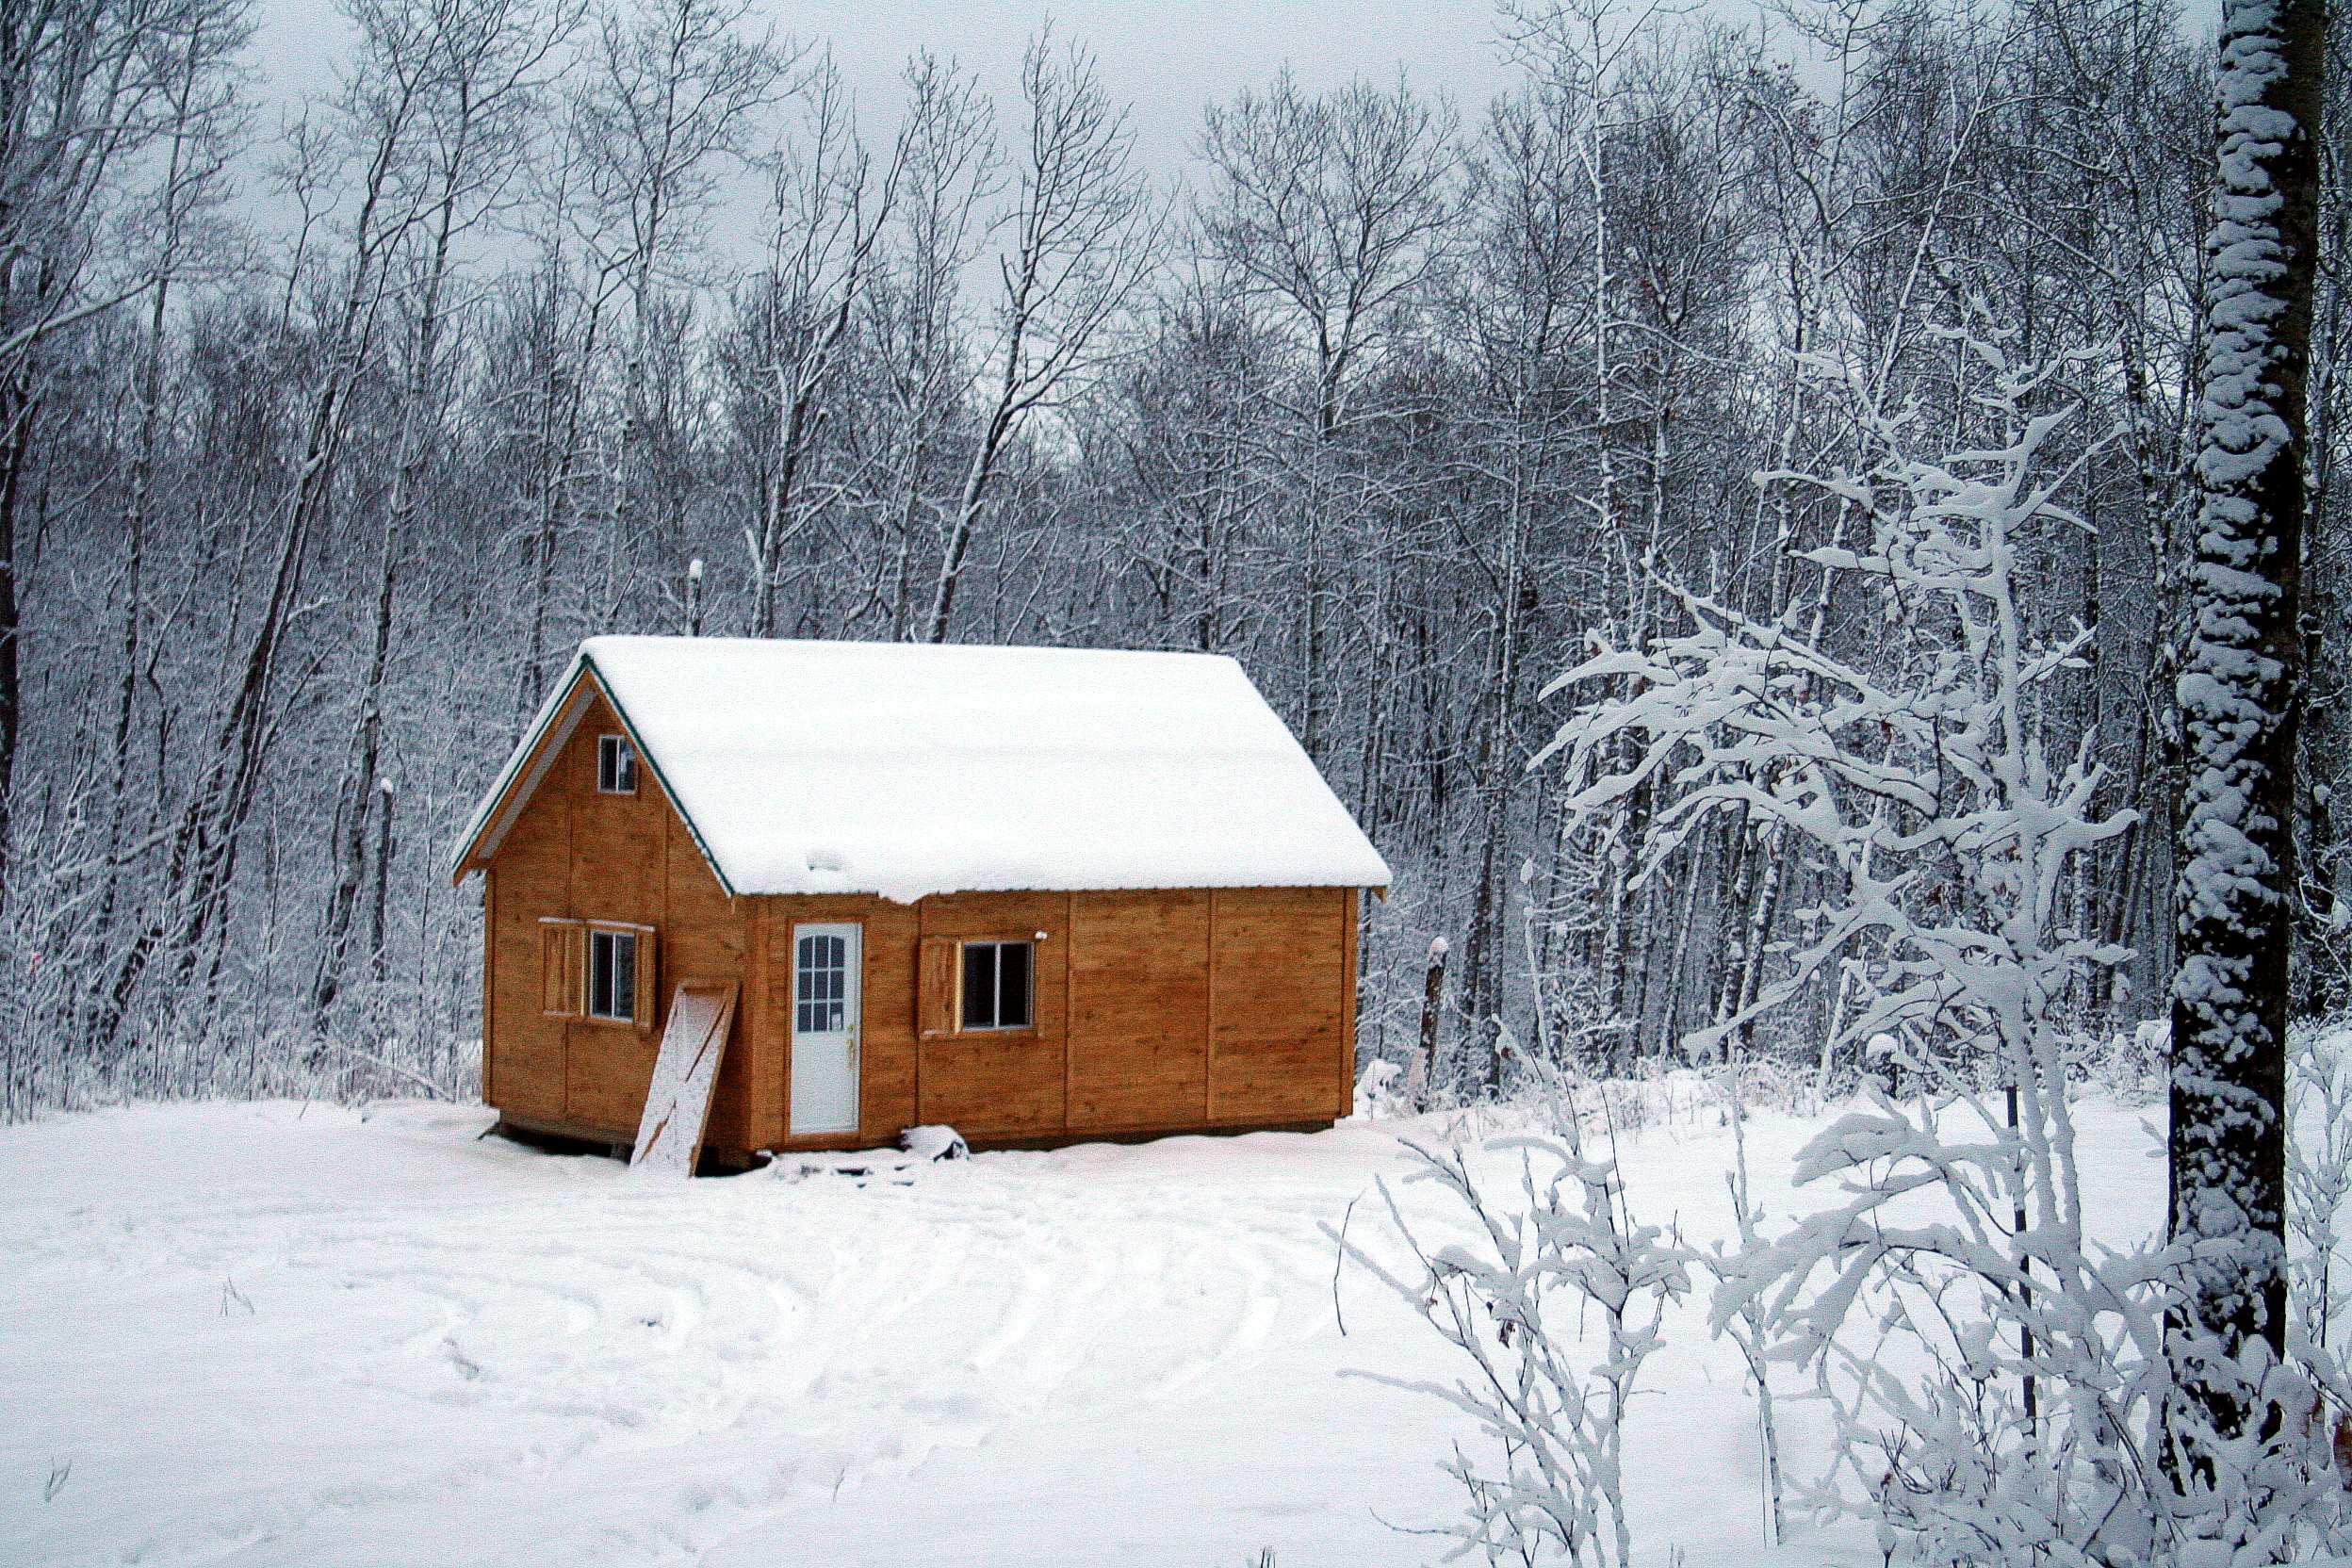 old cabin winter scene wallpaper - photo #29